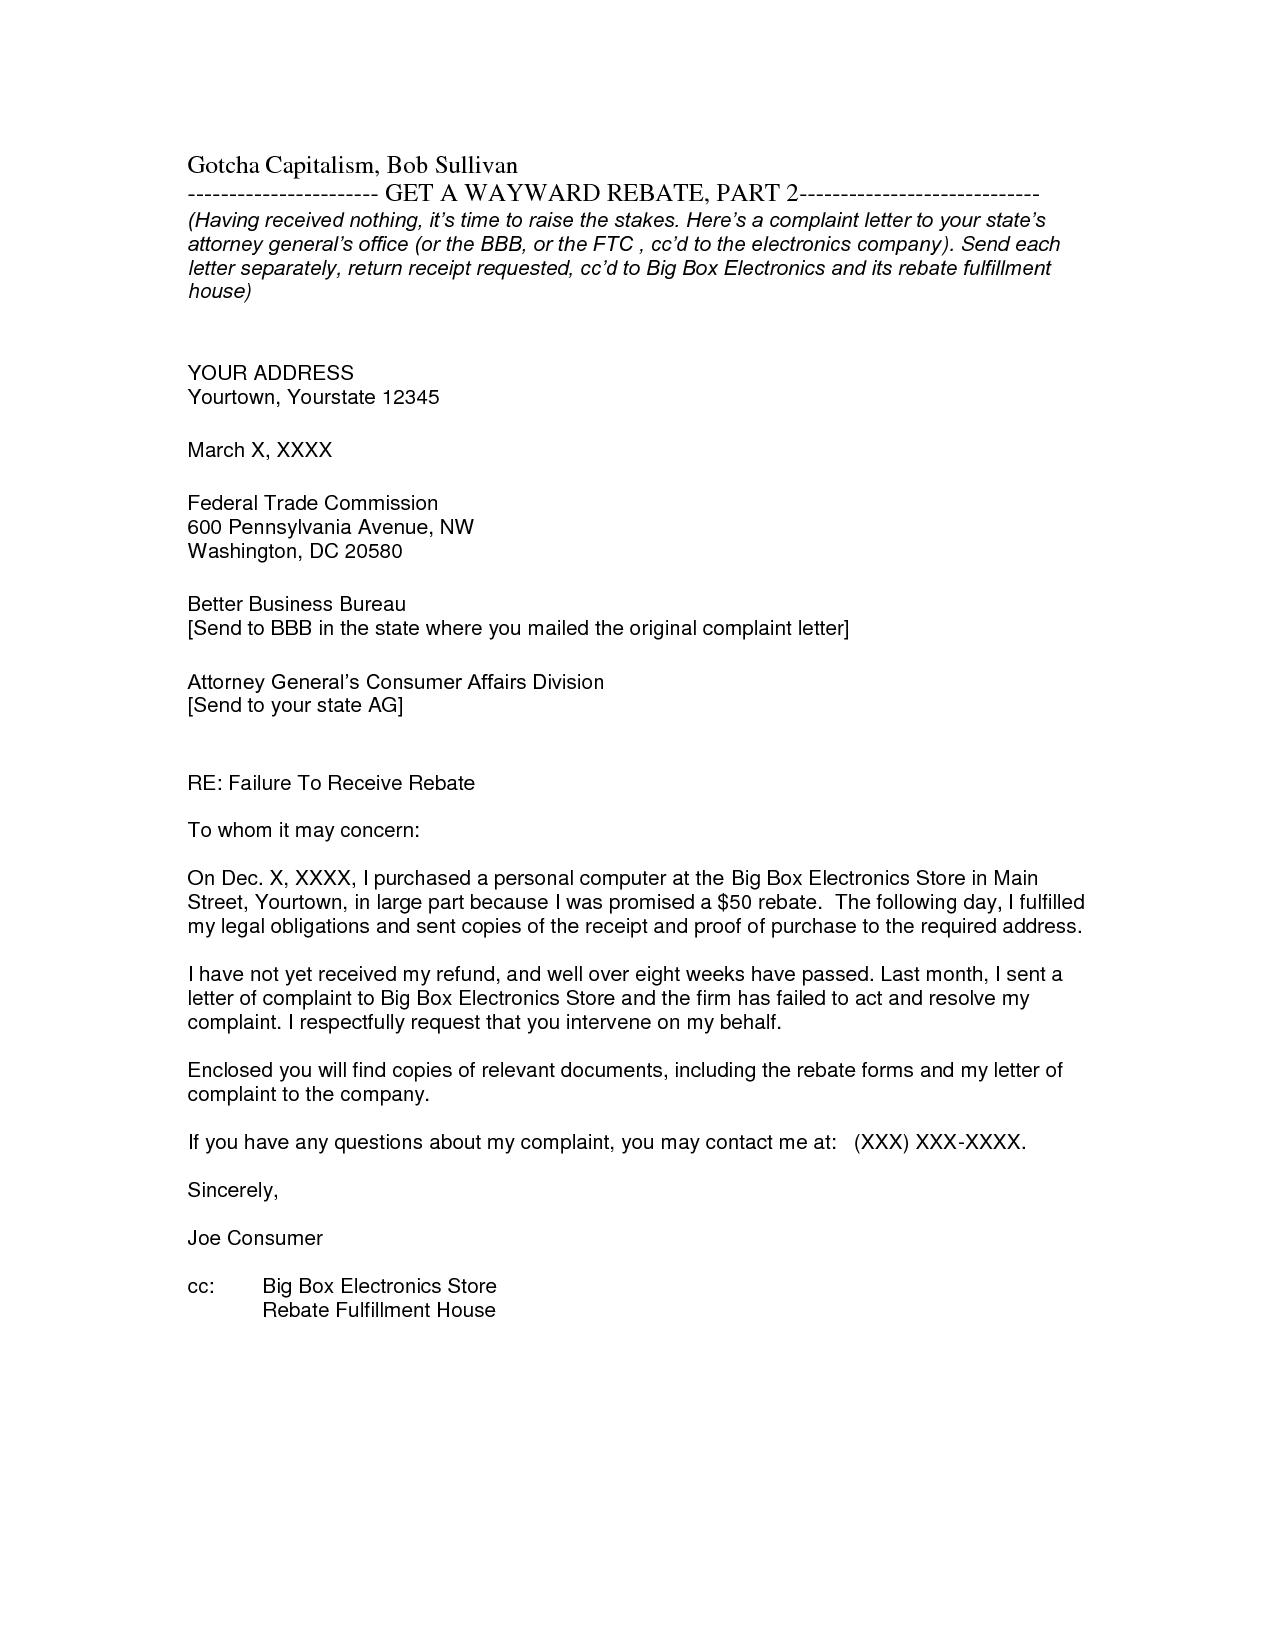 Carbon copy business letter sample joseph stephen timms hard carbon copy business letter sample joseph stephen timms hard postal service spiritdancerdesigns Image collections